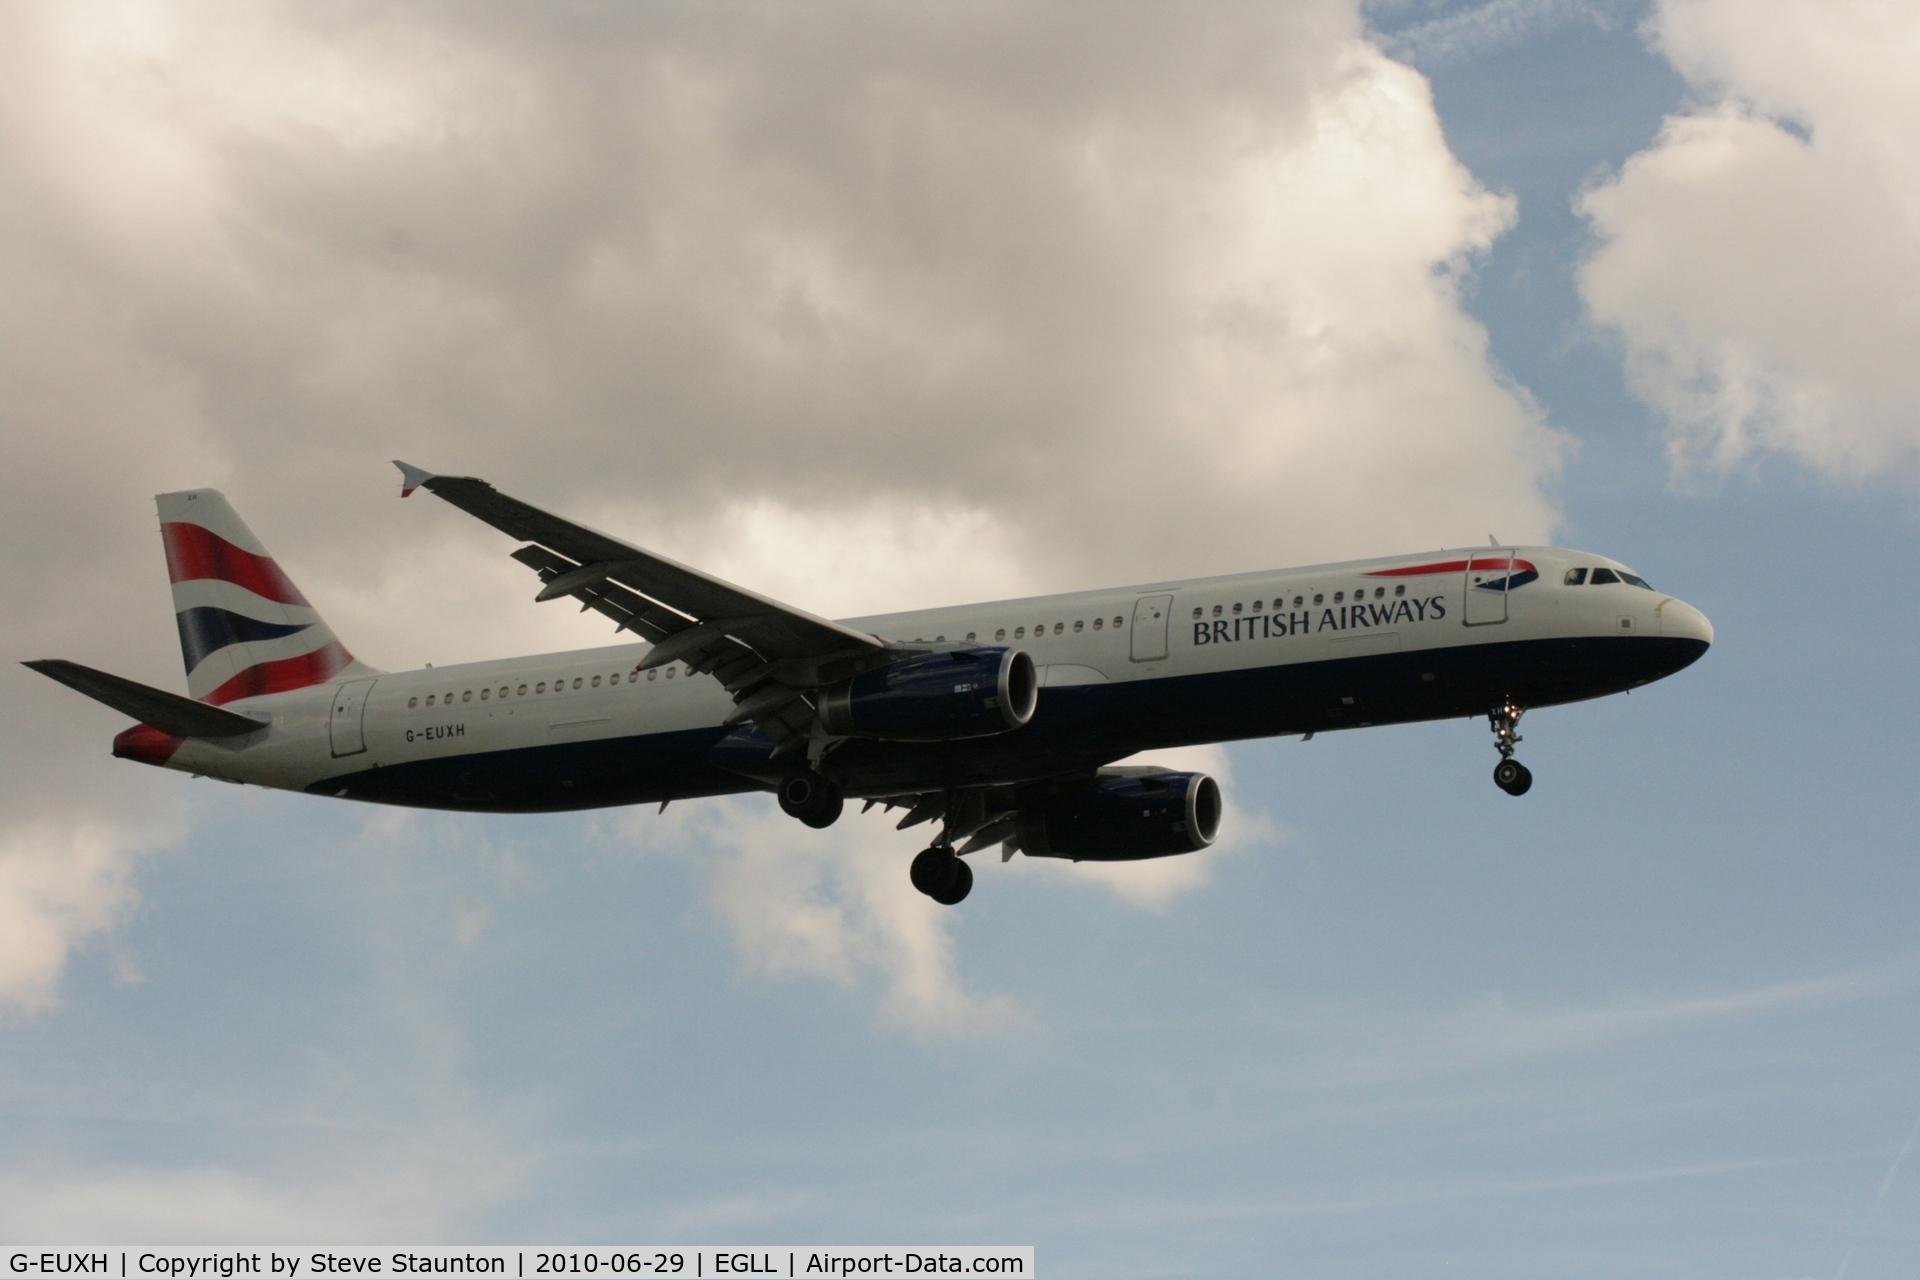 G-EUXH, 2004 Airbus A321-231 C/N 2363, Taken at Heathrow Airport, June 2010